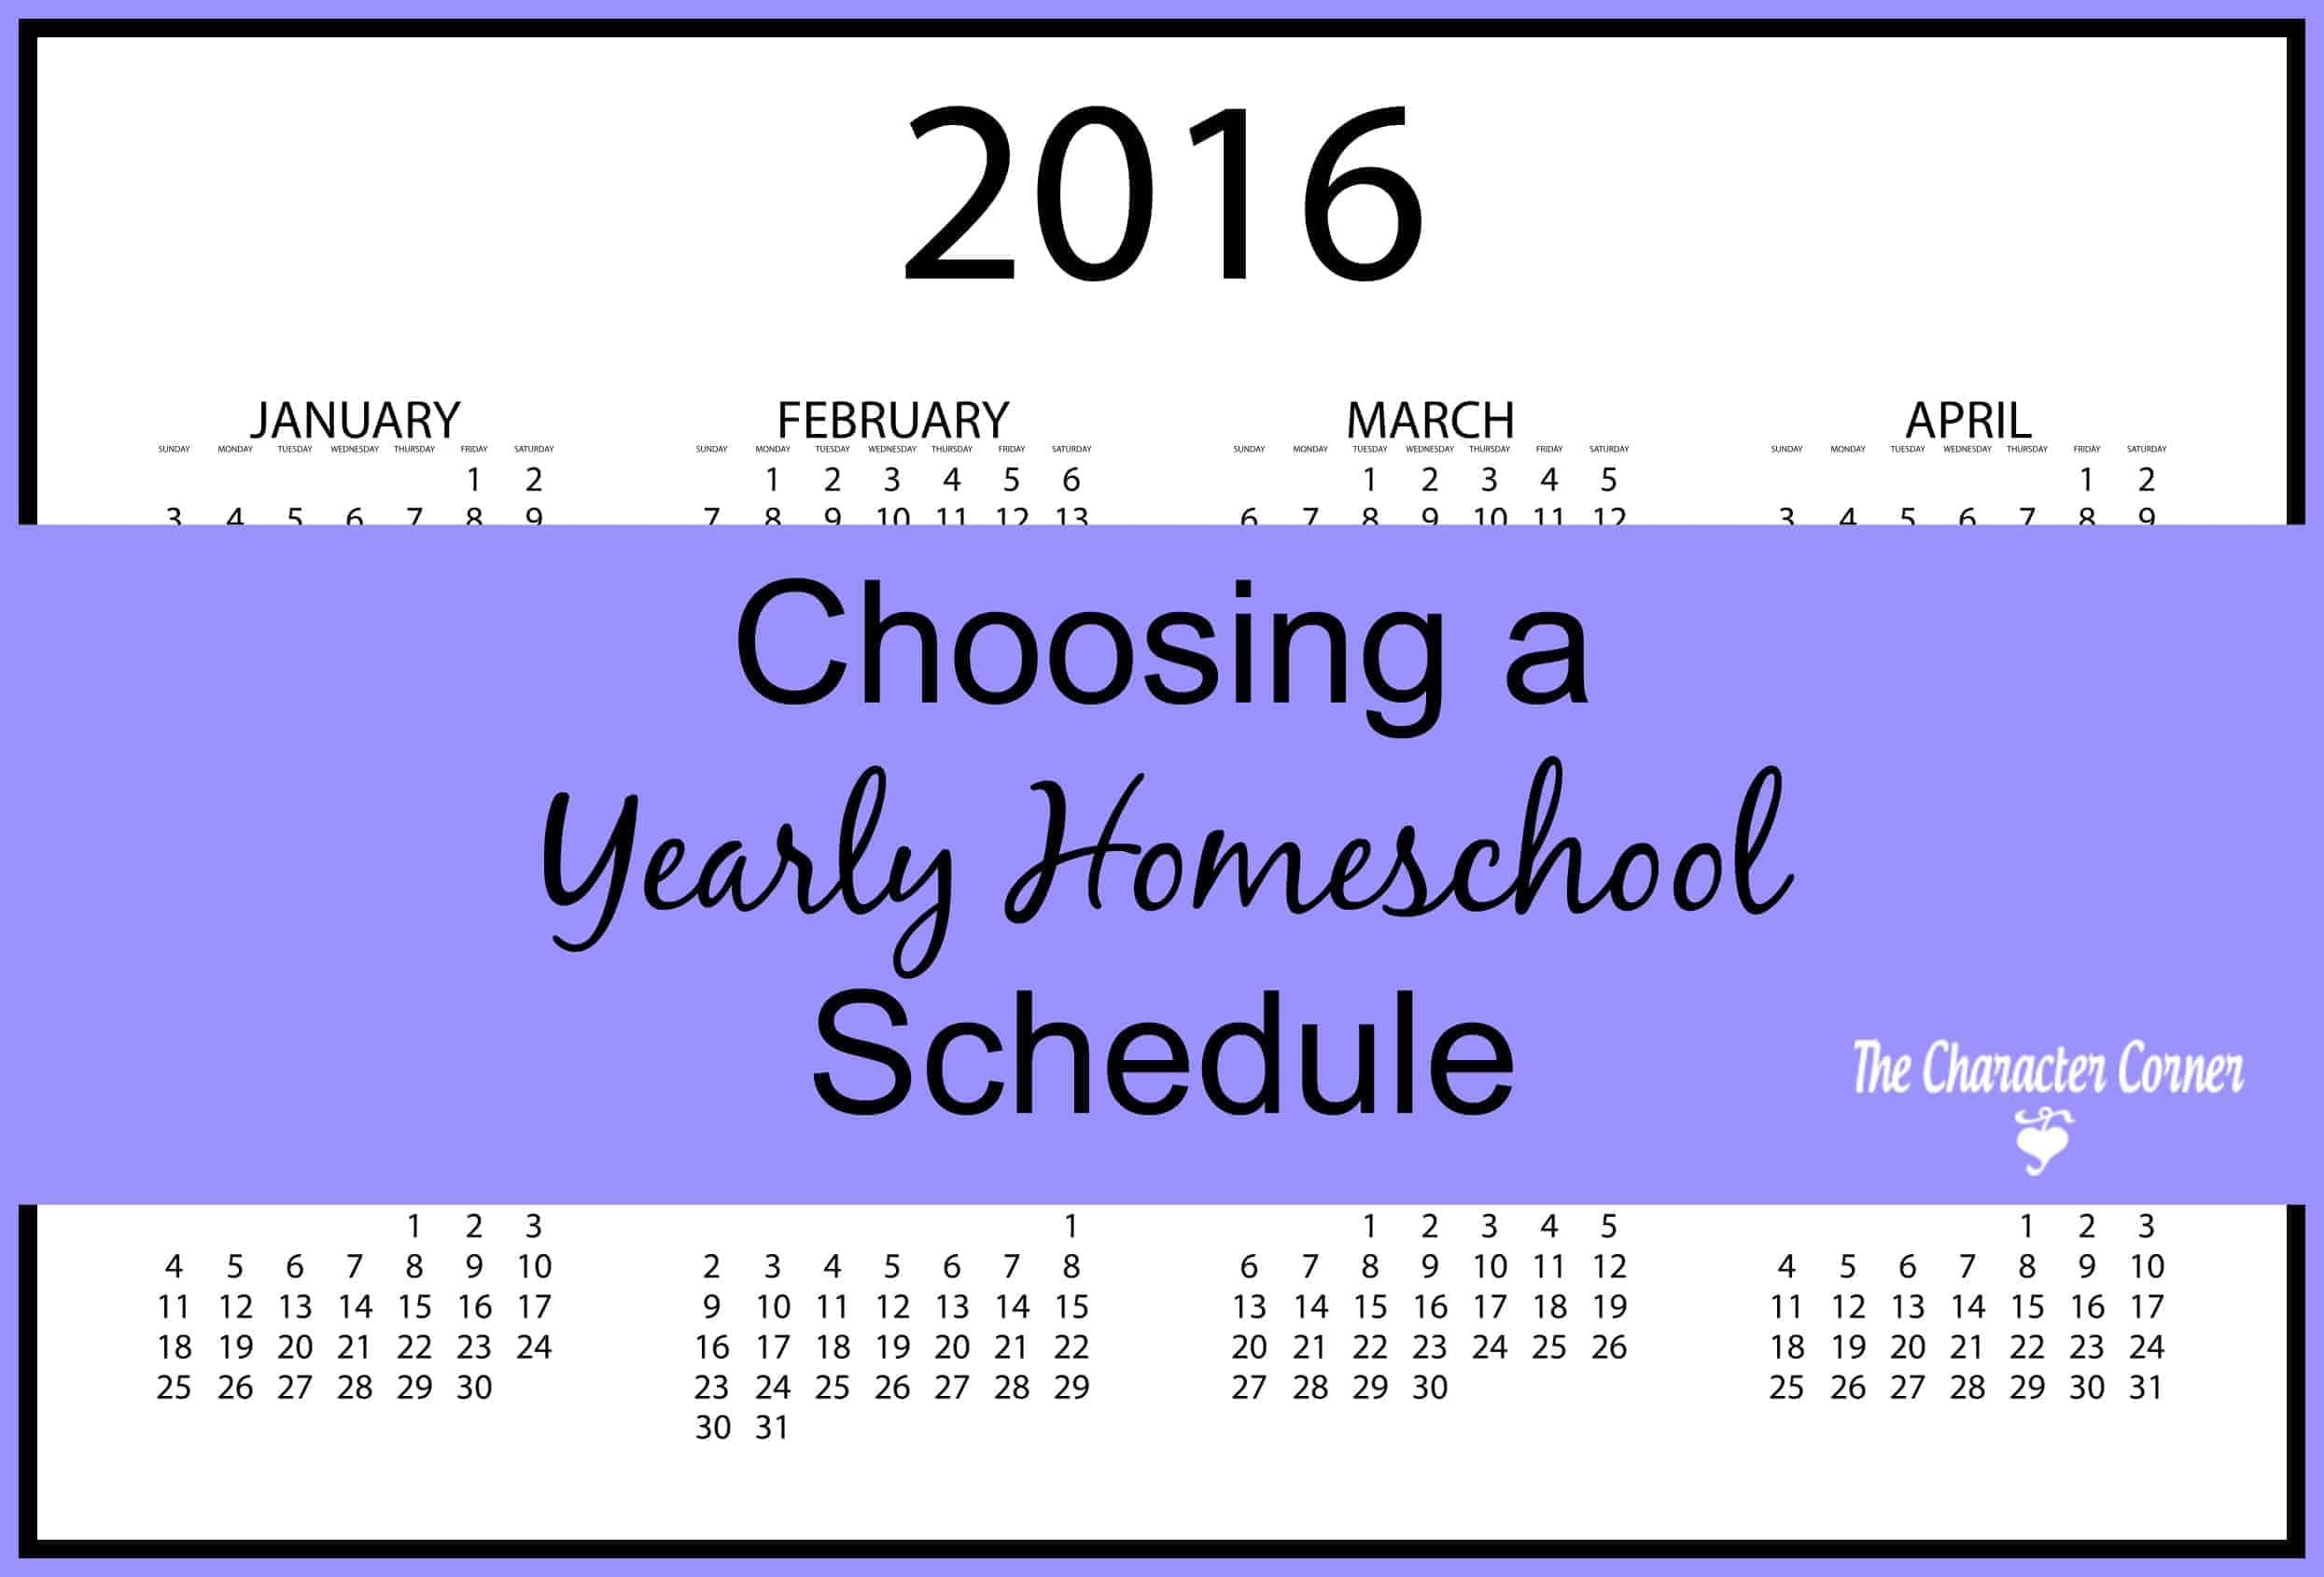 Choosing a yearly homeschool schedule